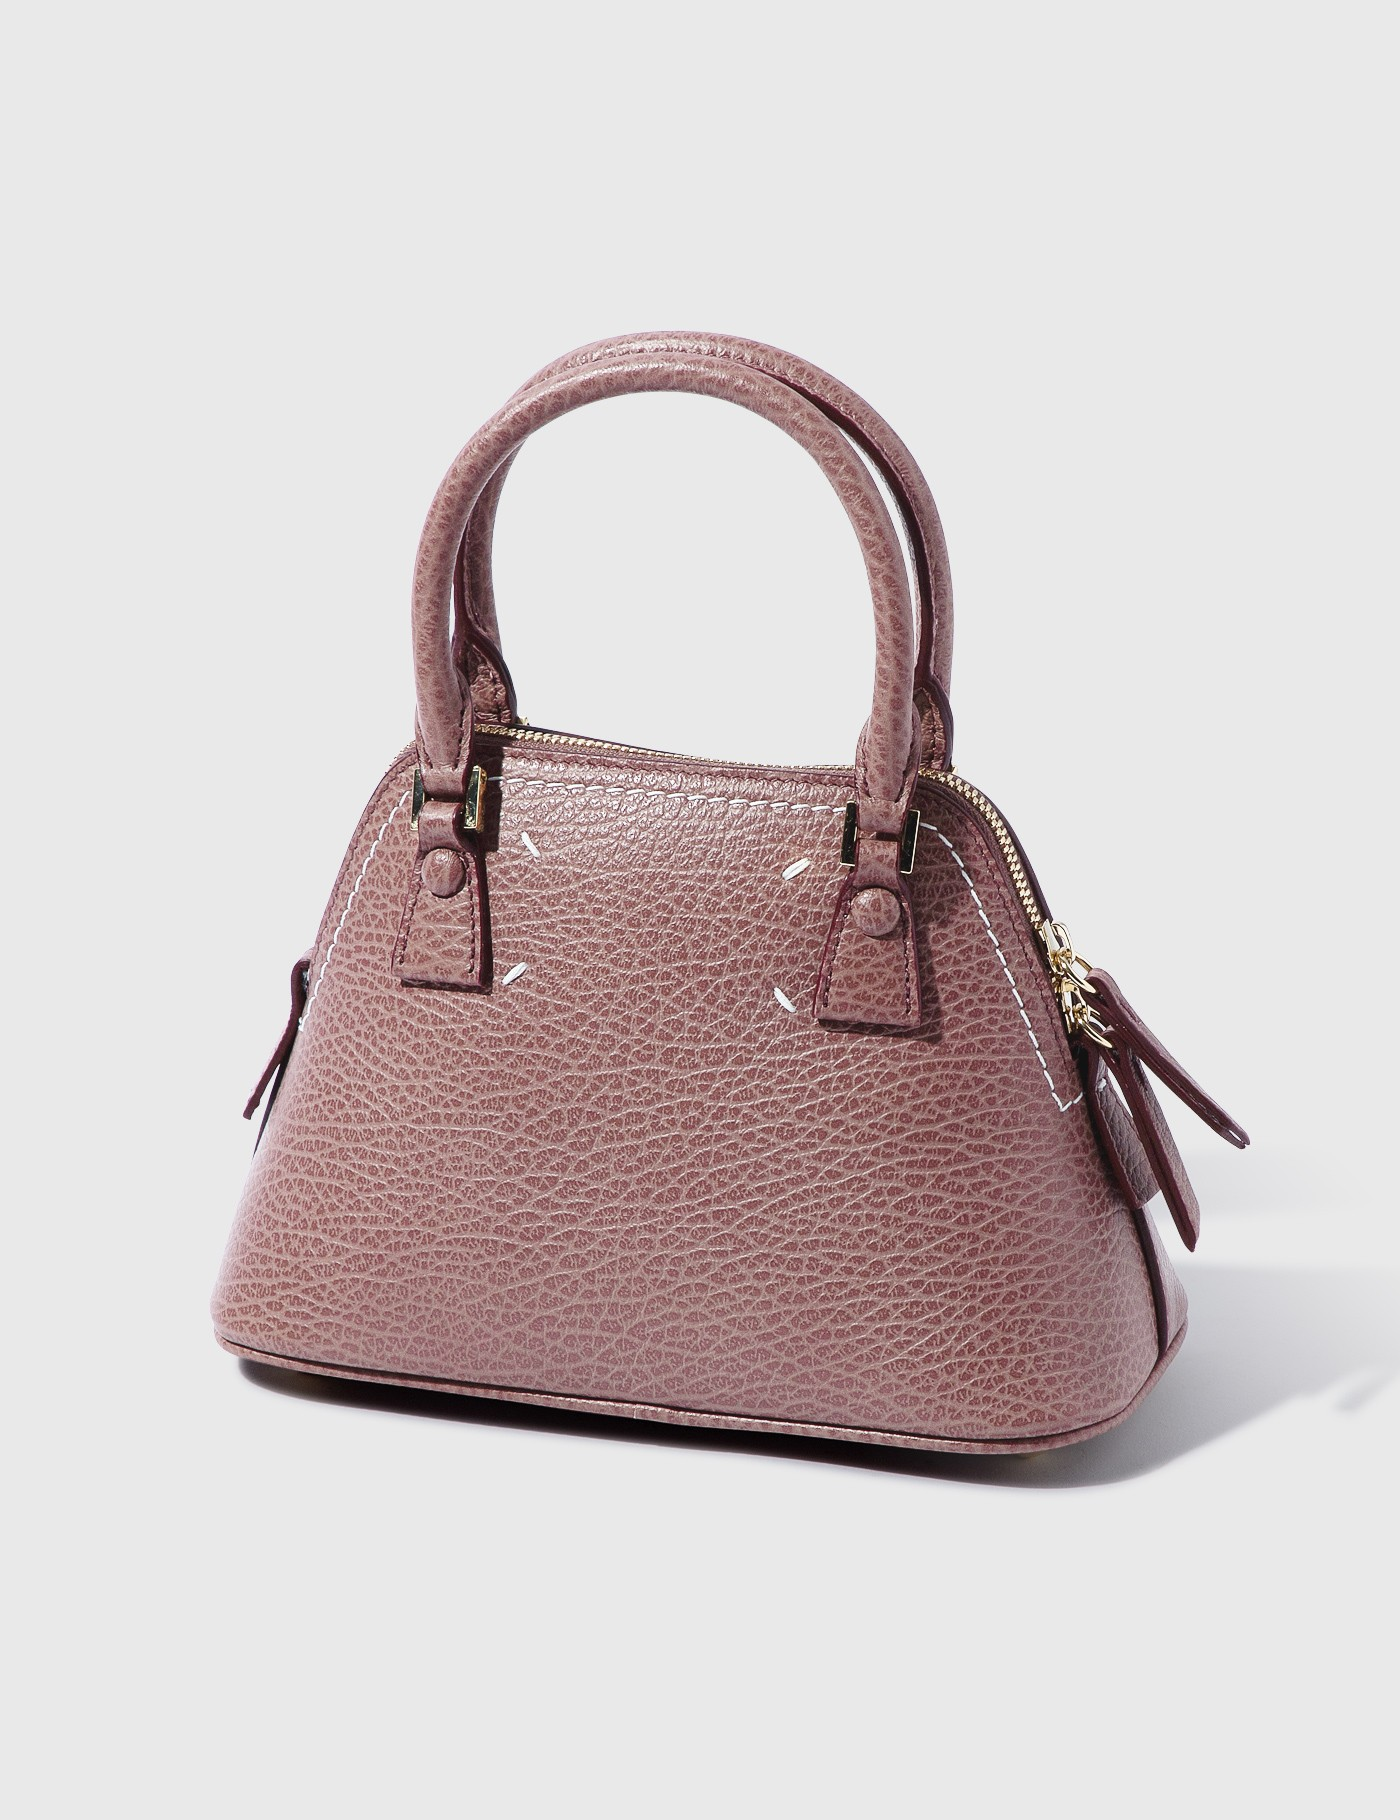 Maison Margiela 5ac Micro Bag In Pink